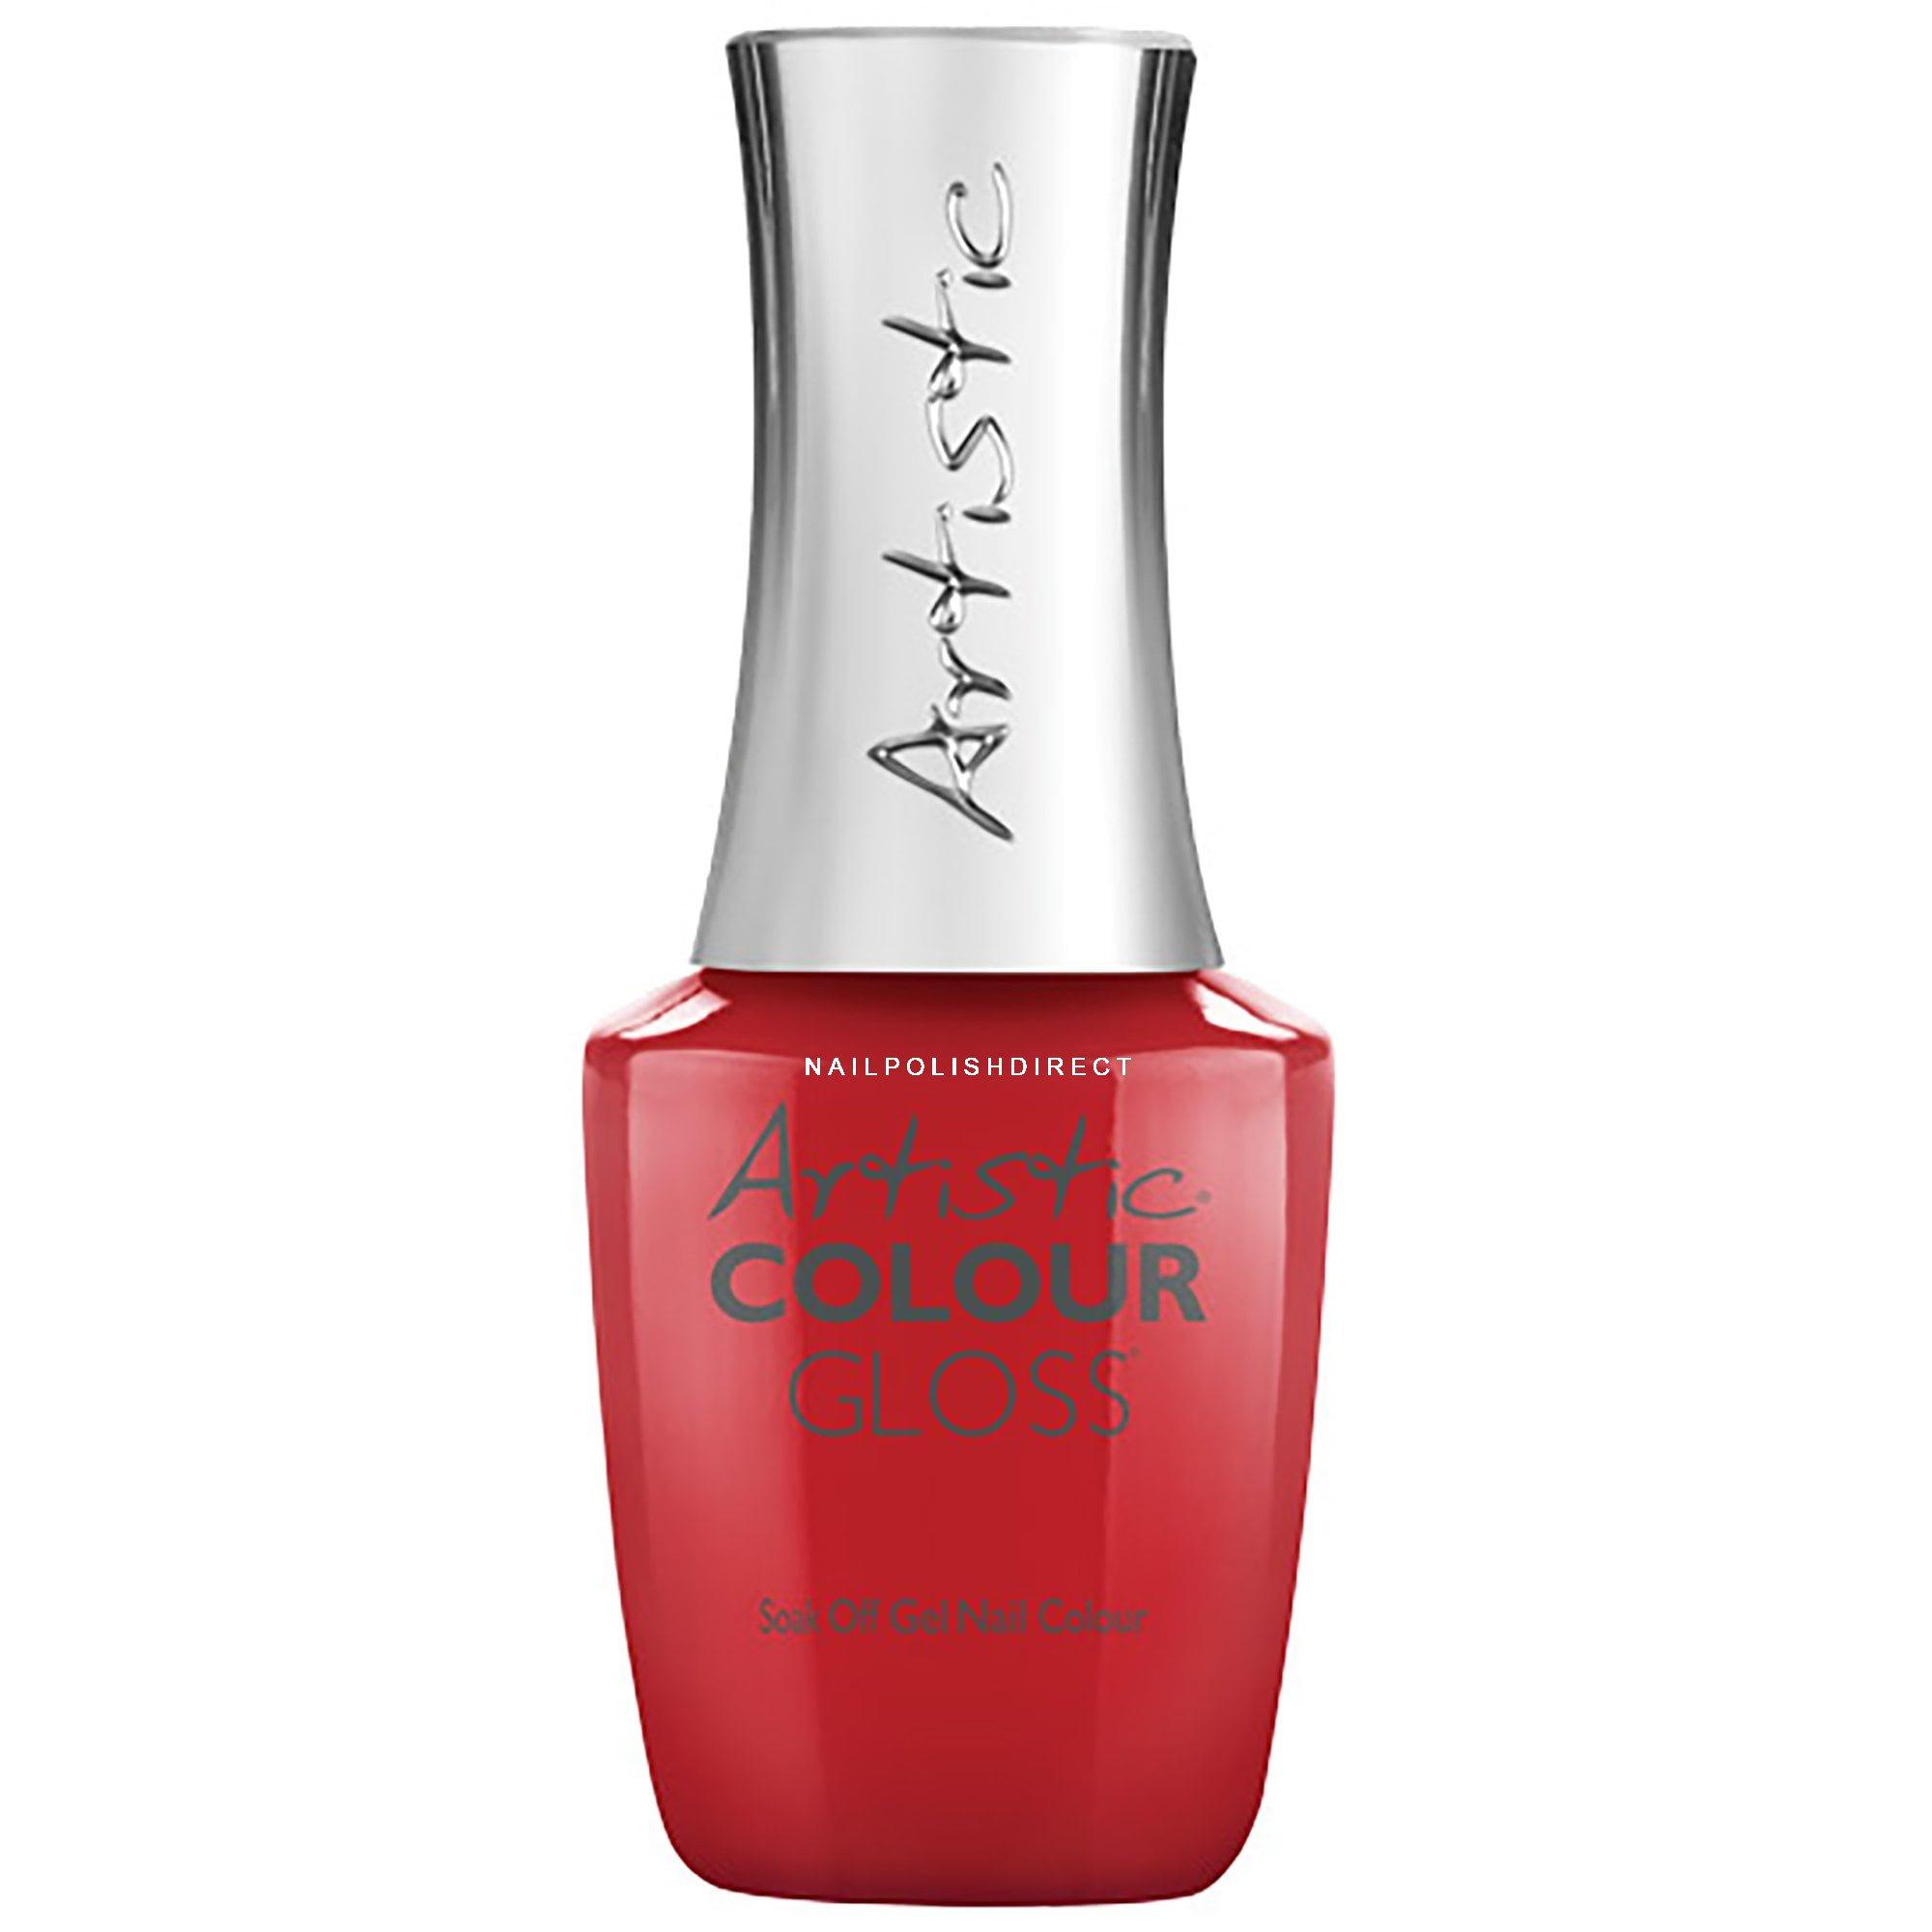 Artistic Colour Gloss Artistic Colour Gloss Soak Off Gel Nail Polish - Social Diva 15ml (03260)